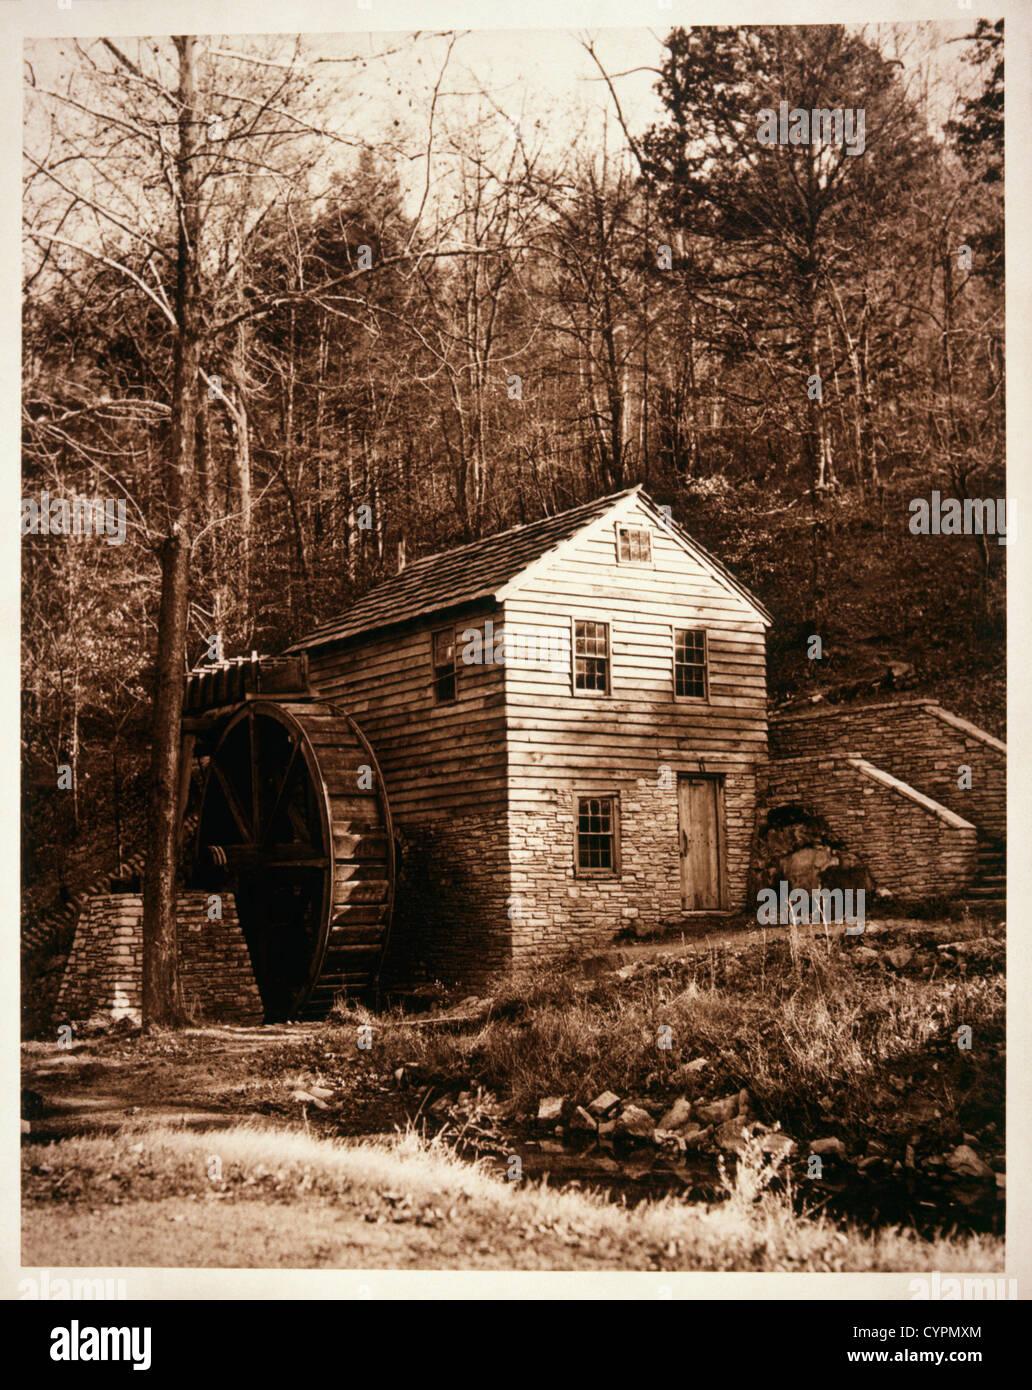 Old Mill, Circa 1900 - Stock Image